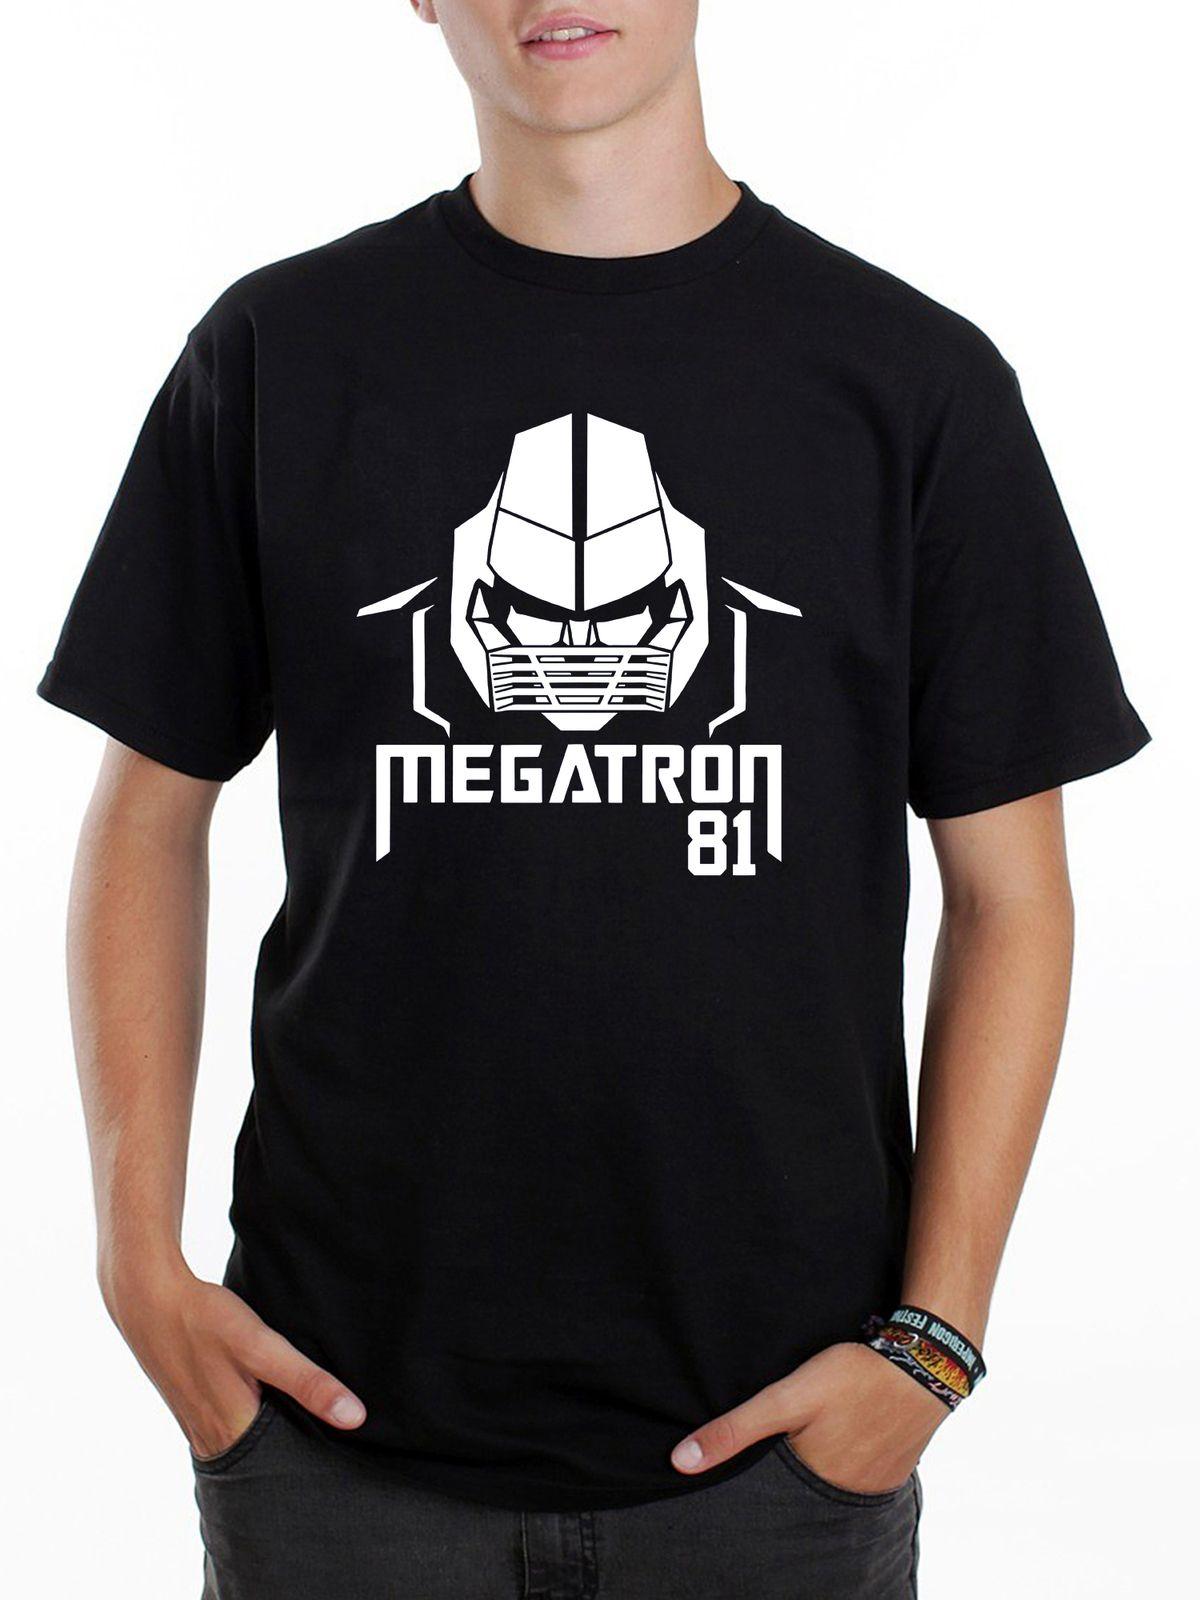 da41d8b0bb4 Men s T-Shirt Megatron Calvin Johnson Lions Nfl 364 Black T-Shirt ...